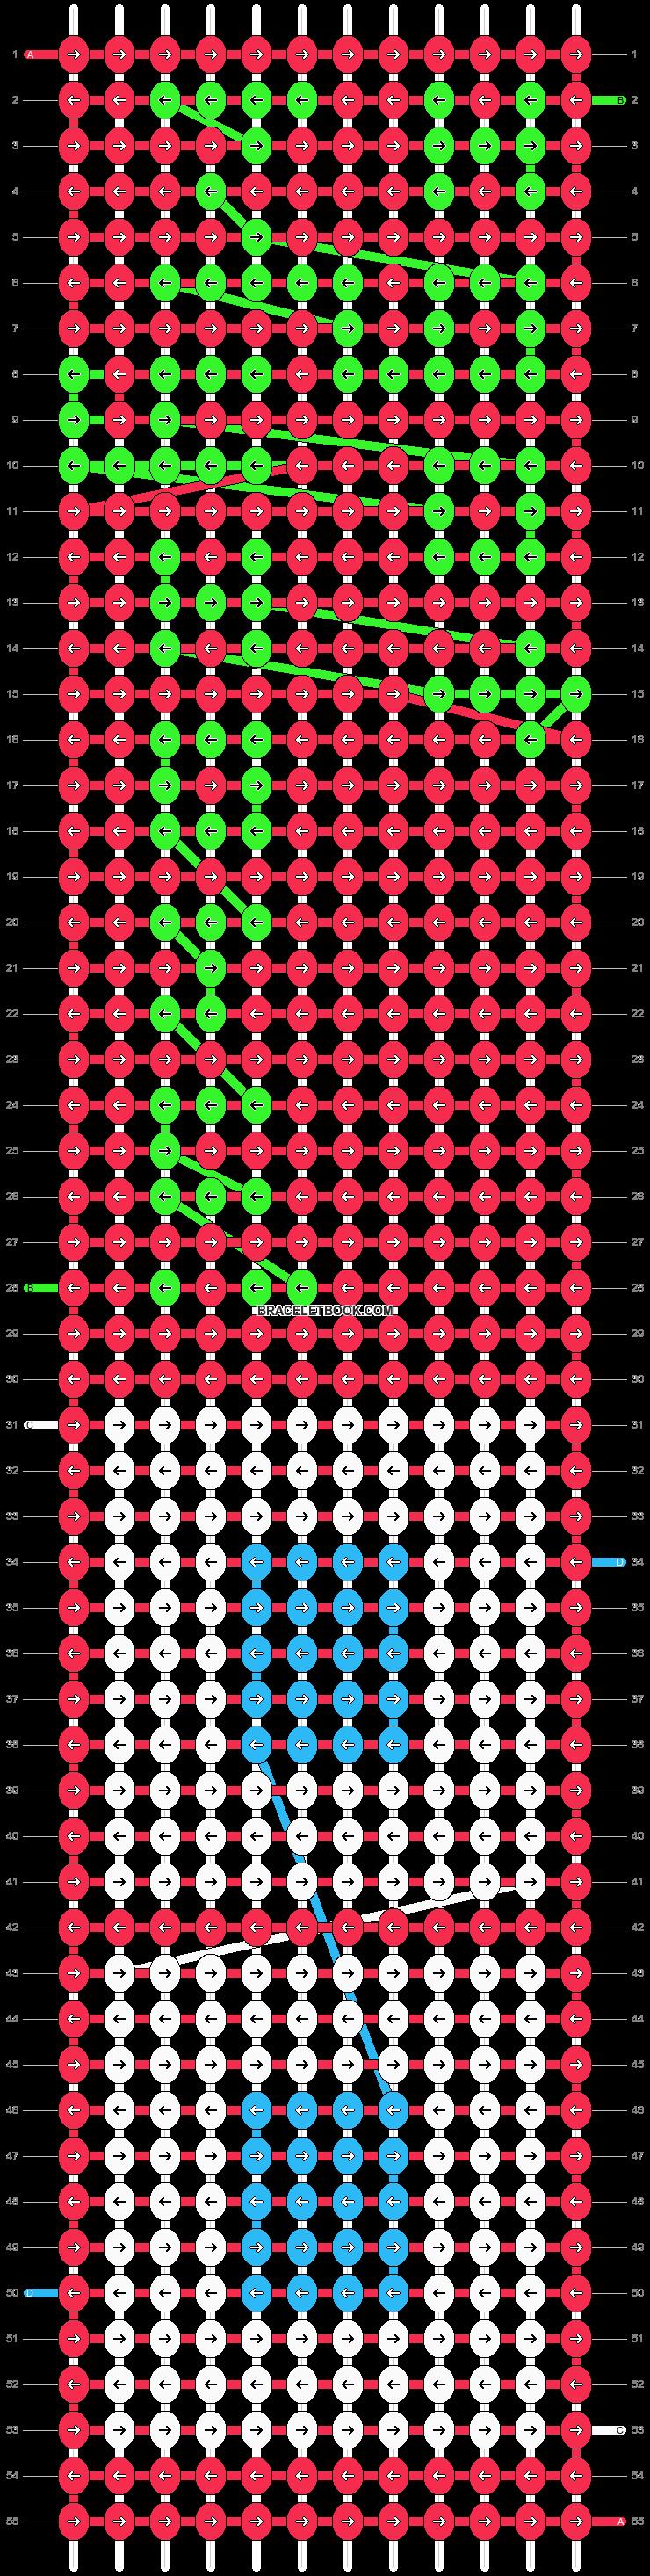 Alpha pattern #13513 pattern